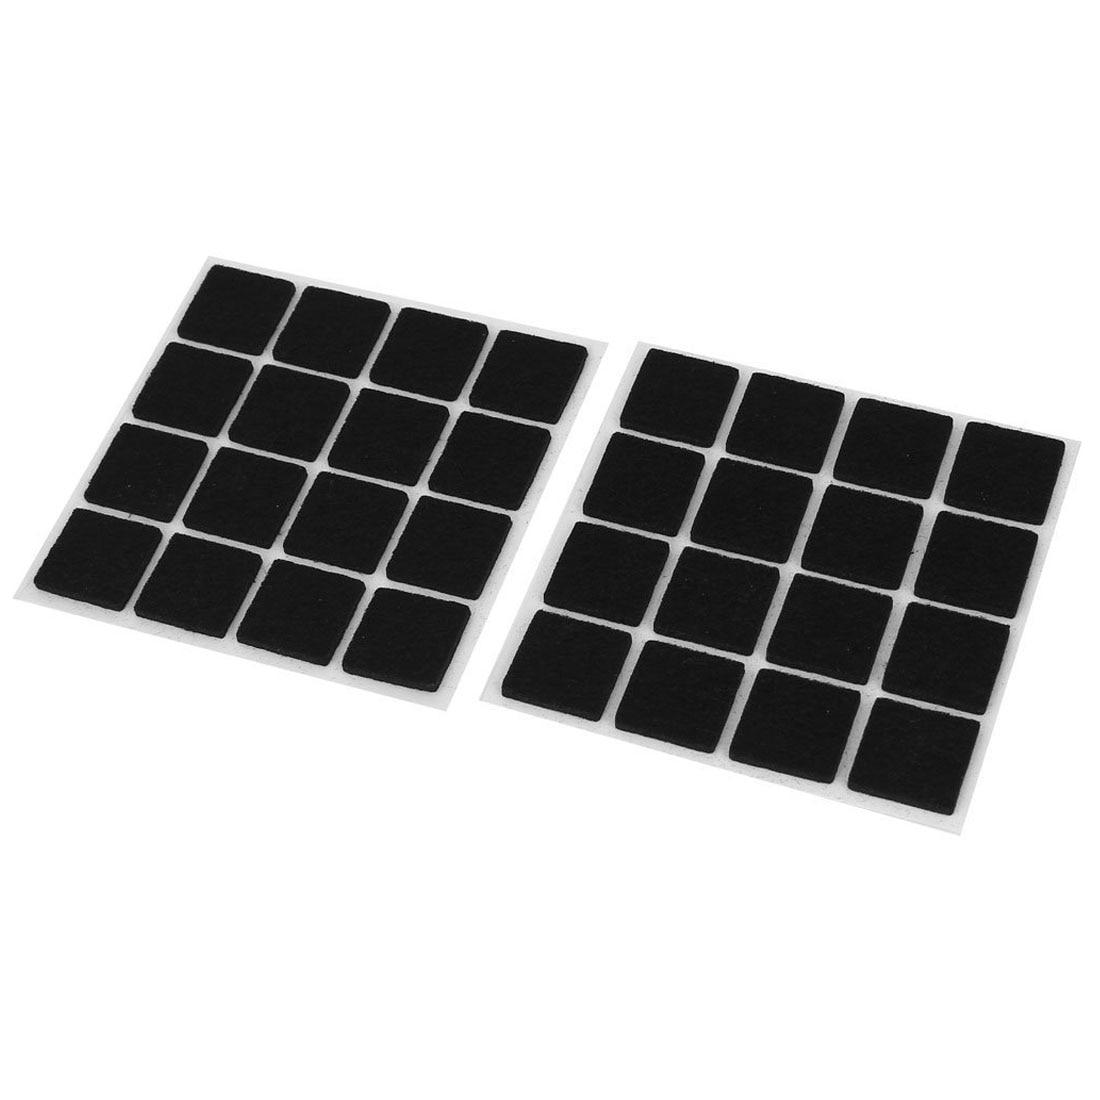 GSFY-Self Adhesive Floor Protectors Furniture Felt Square Pads 32pcs